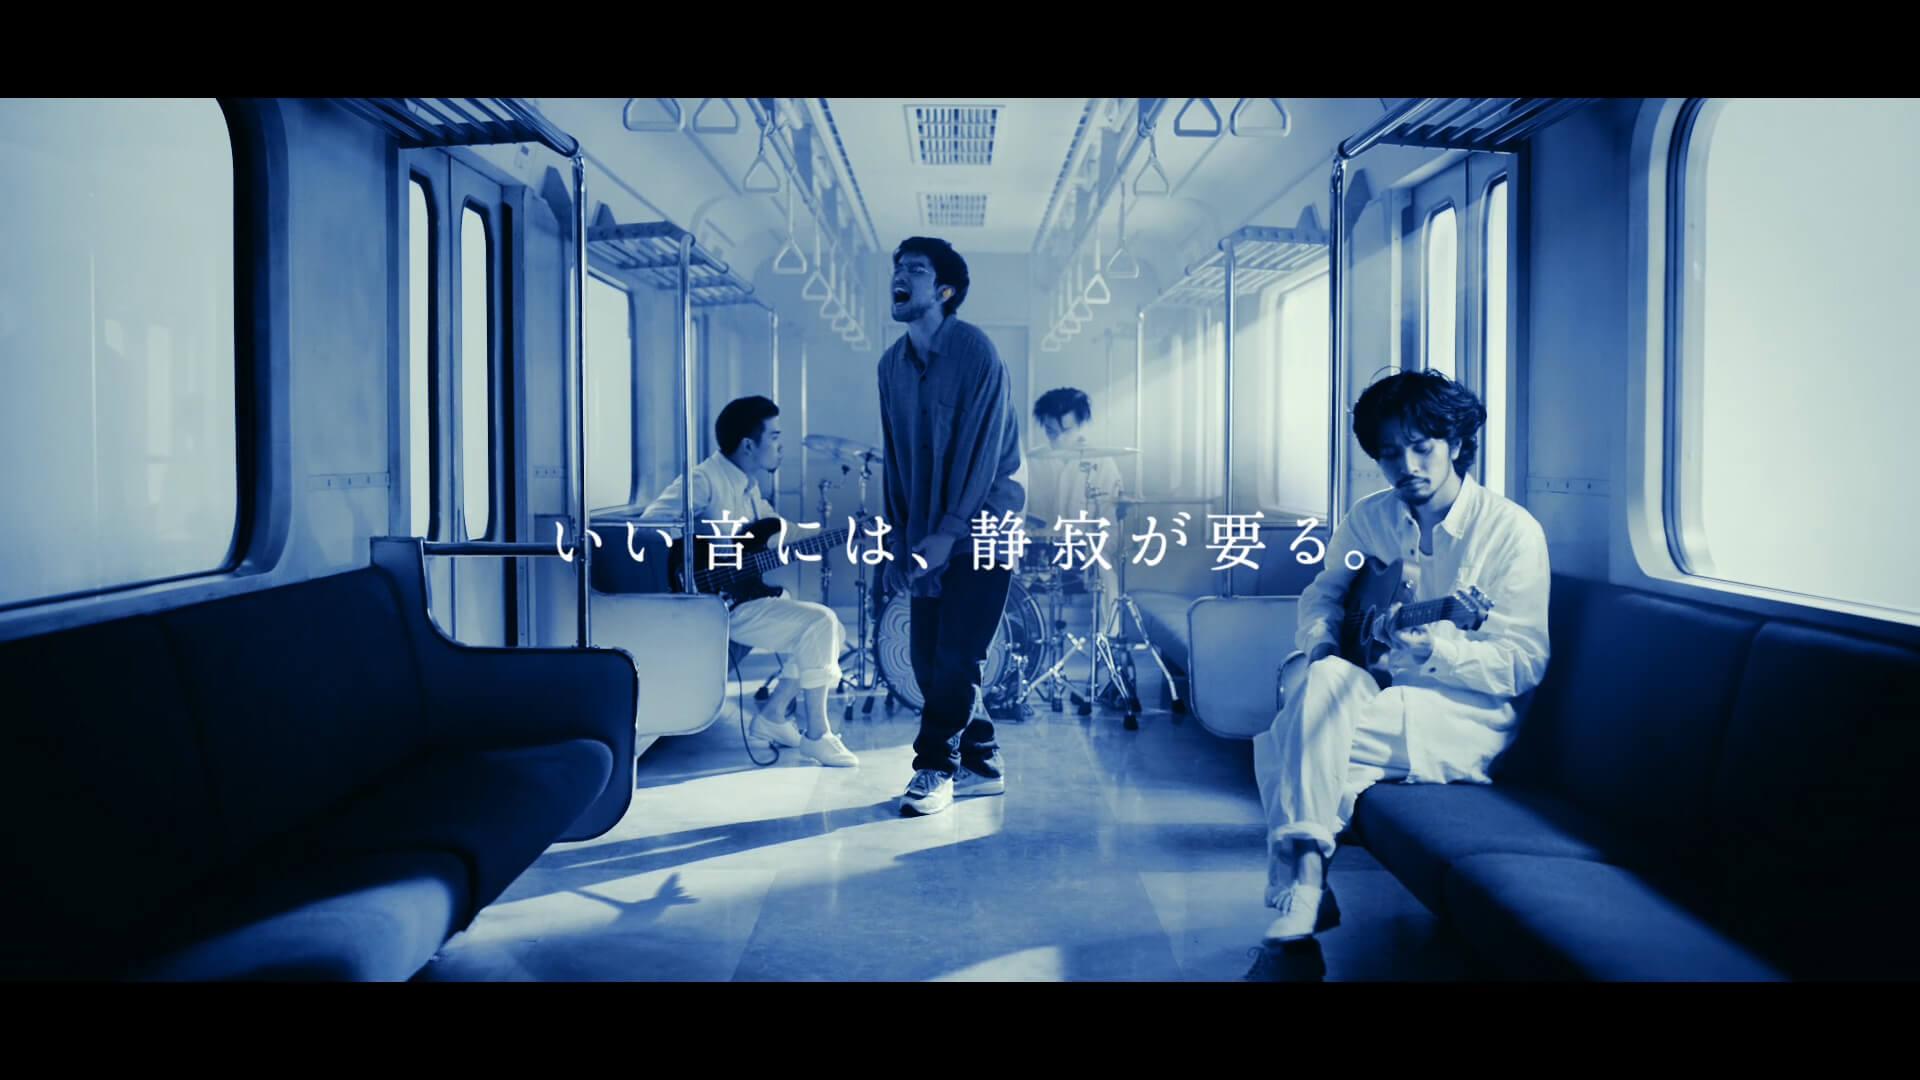 King Gnu、ソニーの完全ワイヤレス型ノイキャンイヤホン『WF-1000XM3』の新CMに出演 CMソングに「Teenager Forever」を初音源化 music191001_kinggnu_cm_6